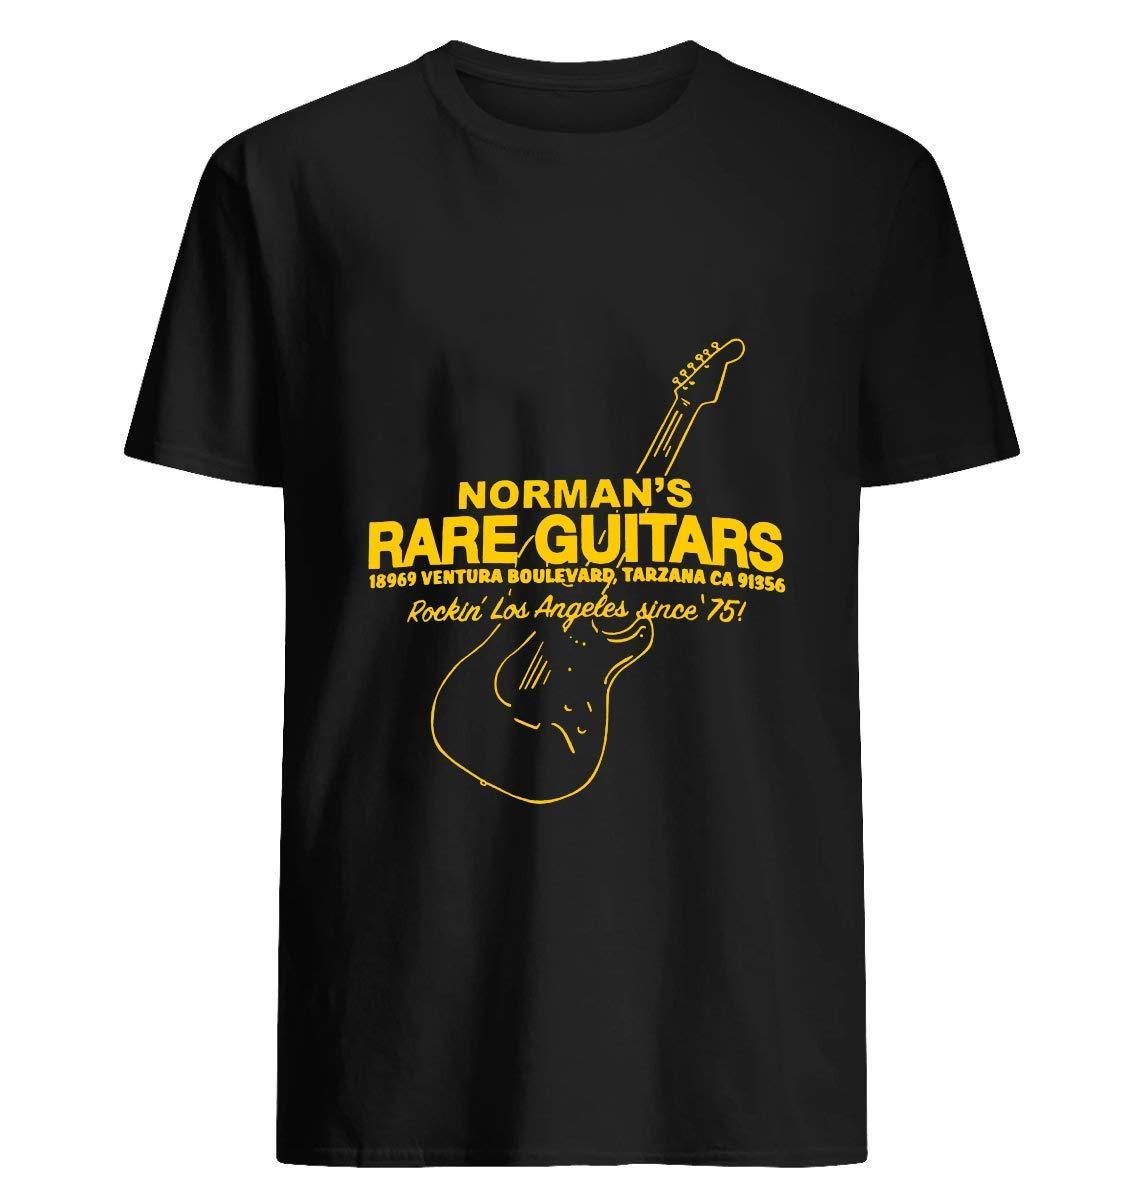 Norman s Rare Guitars Shirt 10 T shirt Hoodie for Men Women Unisex by